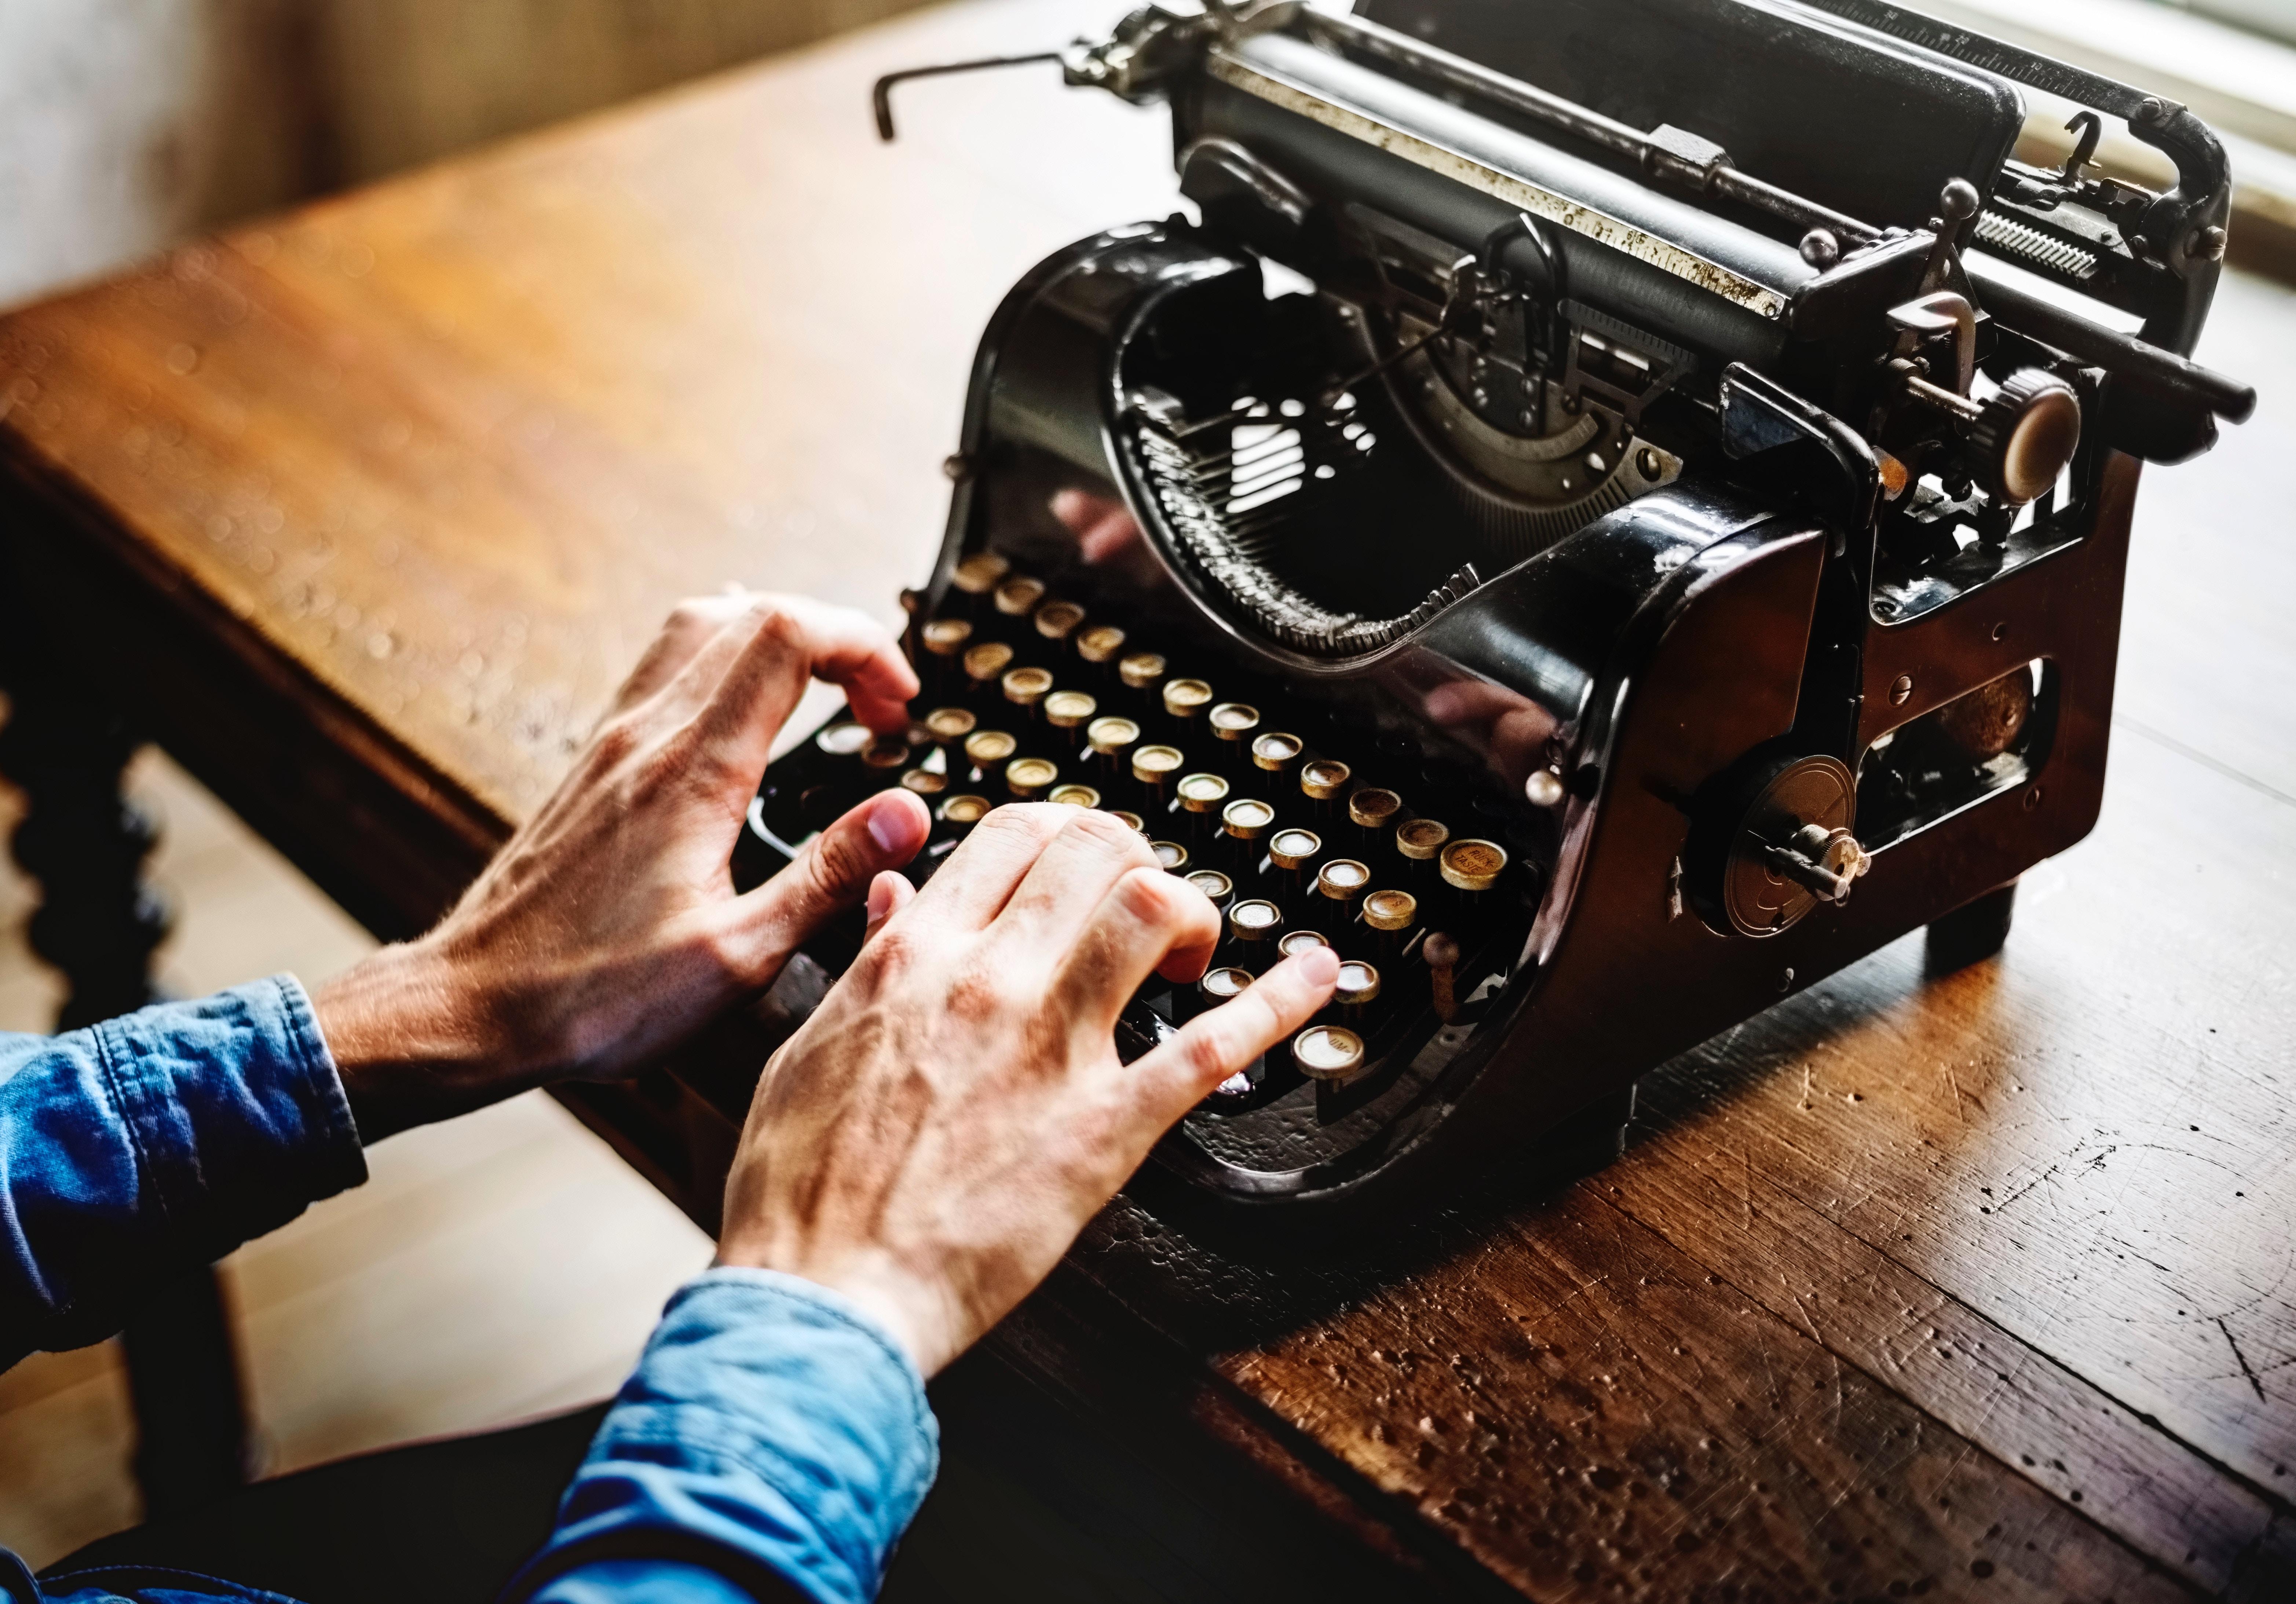 A close up on a typewriter.